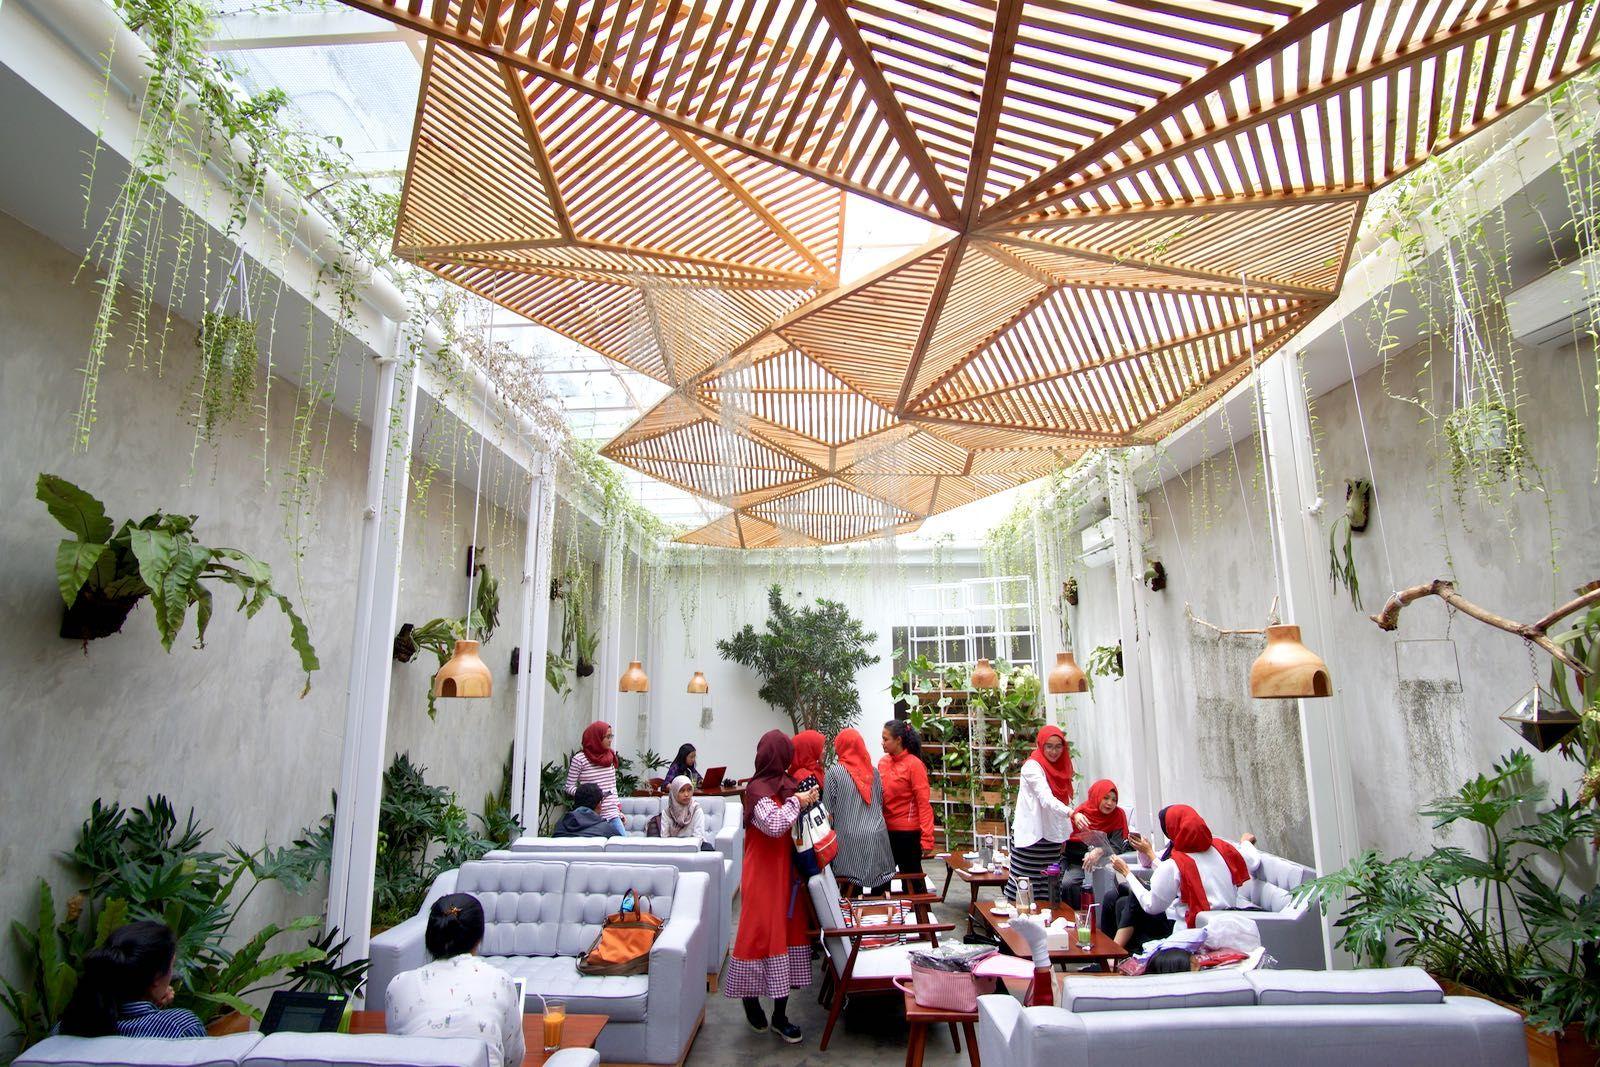 Cafe Dekat Kebun Binatang Bandung